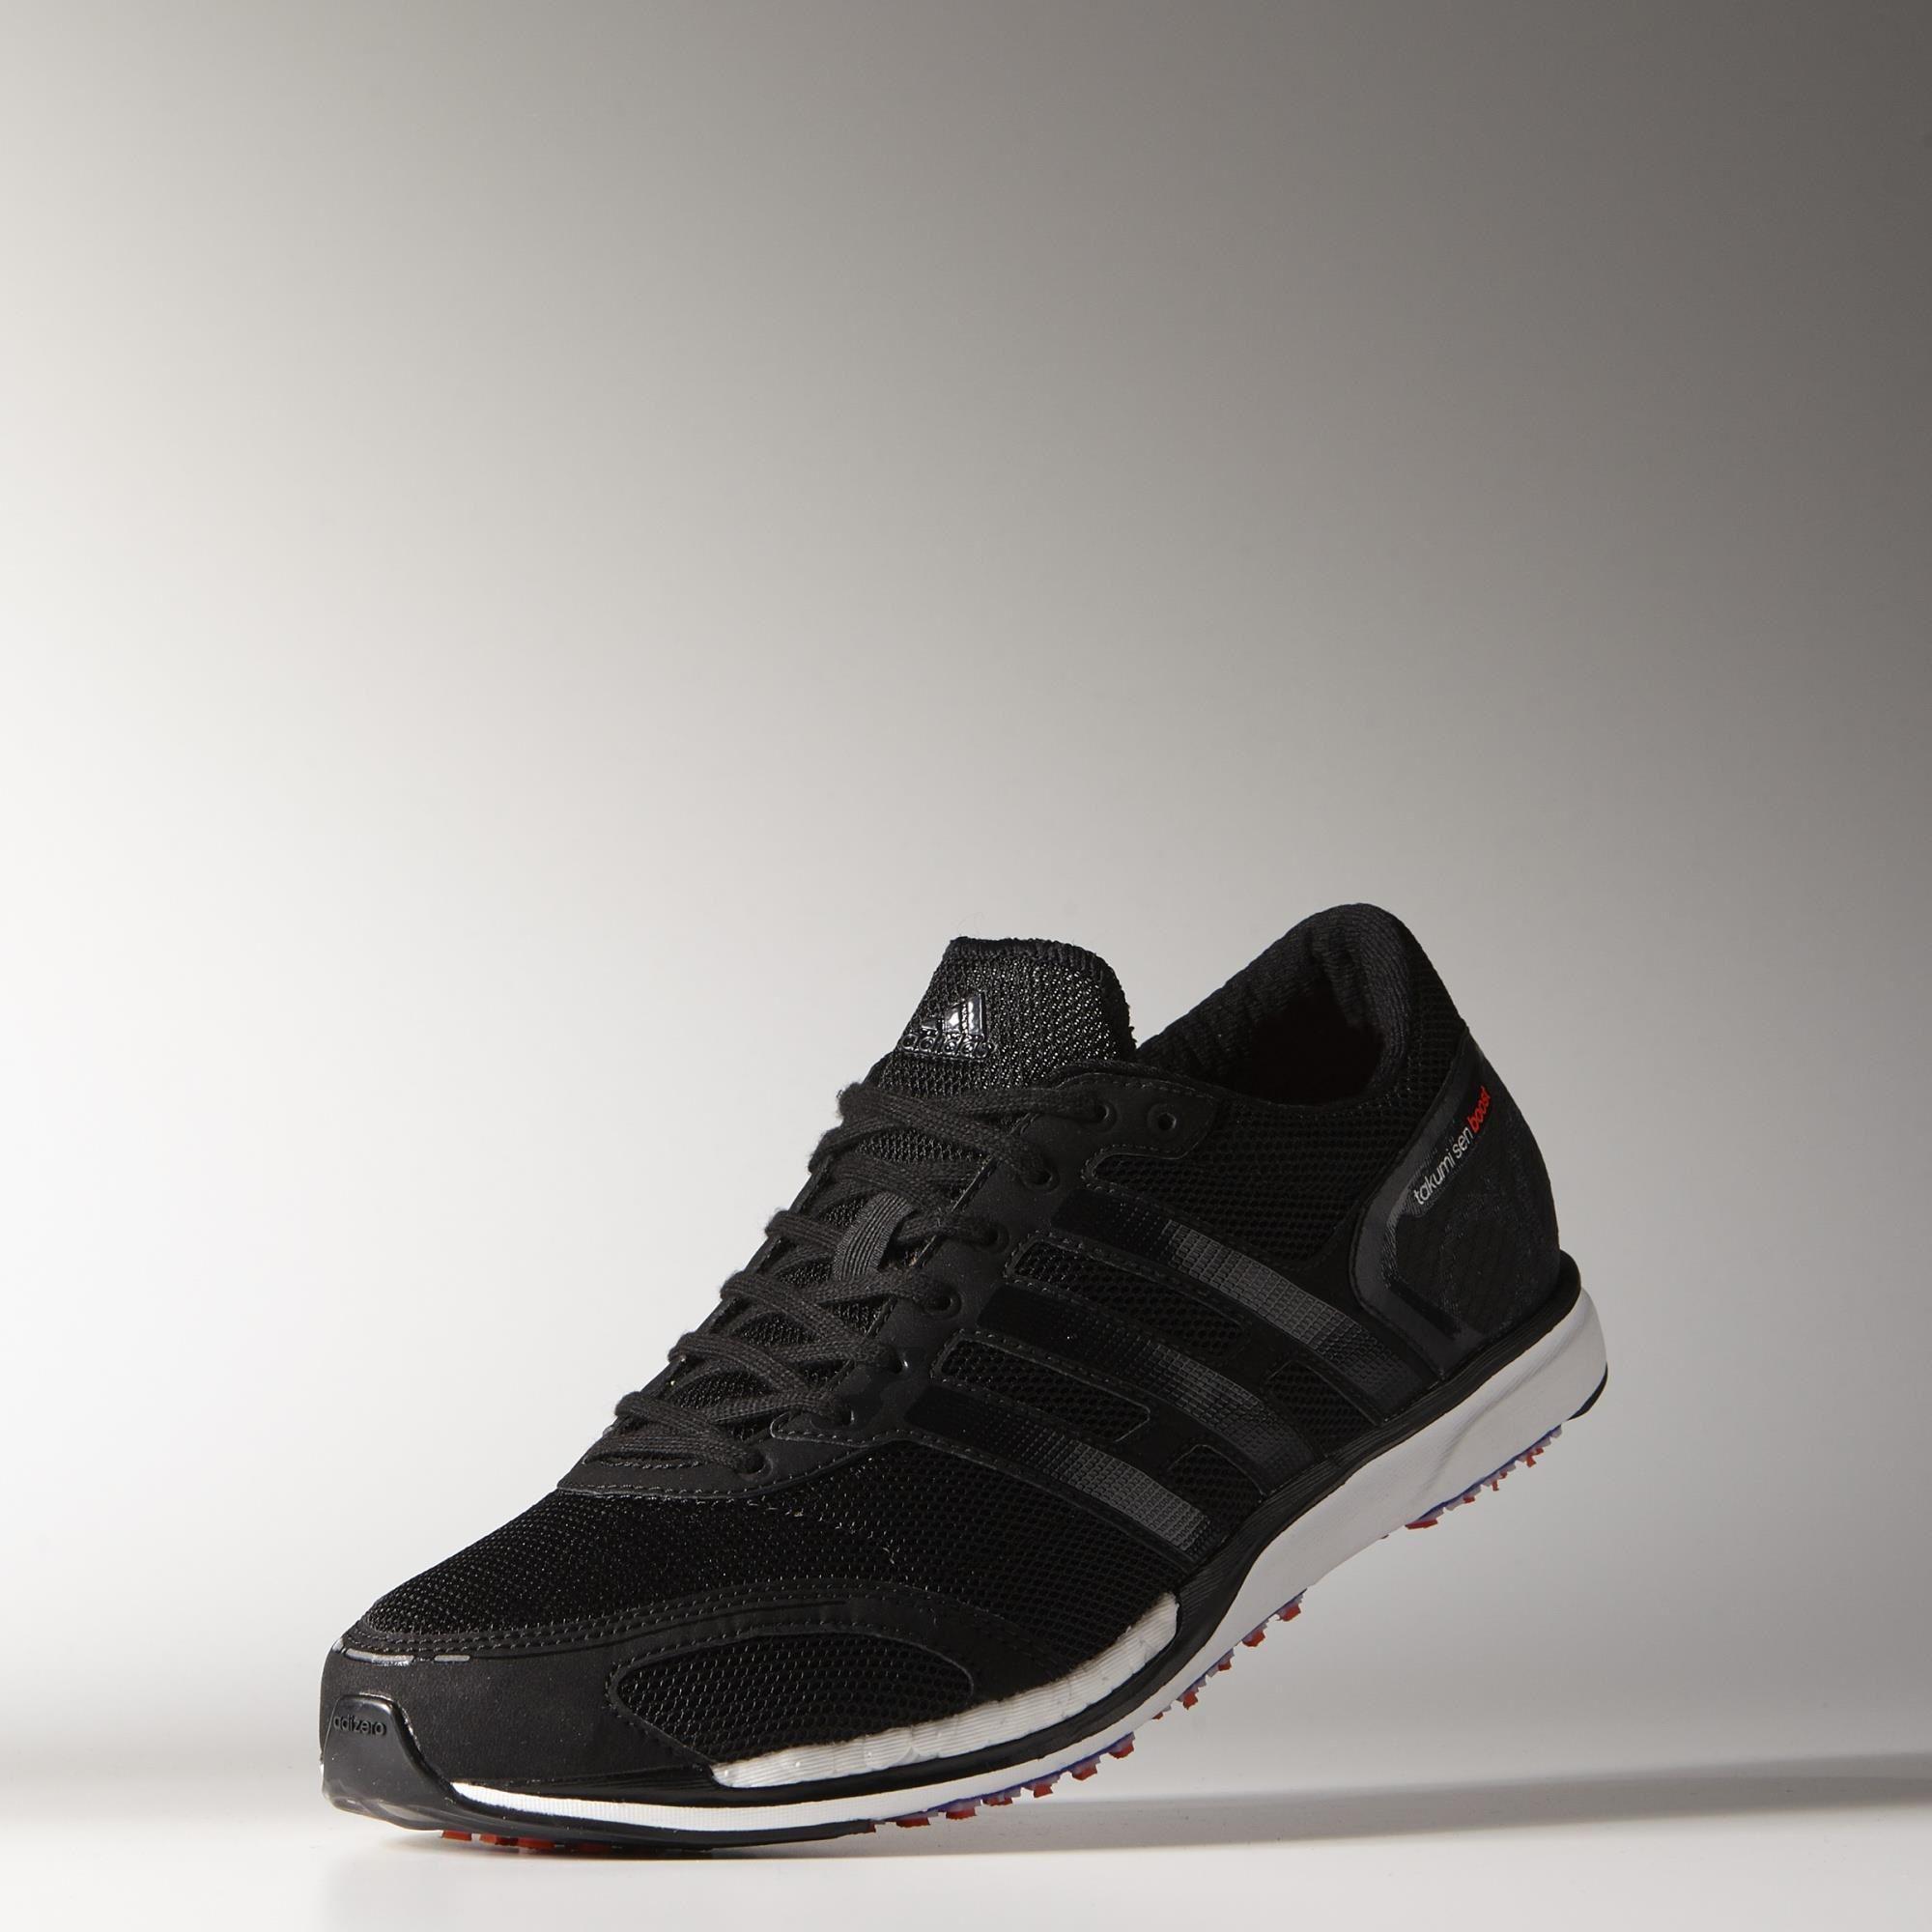 a7b6c729666 Adidas Mens Adizero Takumi Sen Boost 3 Running Shoes - Black White ...